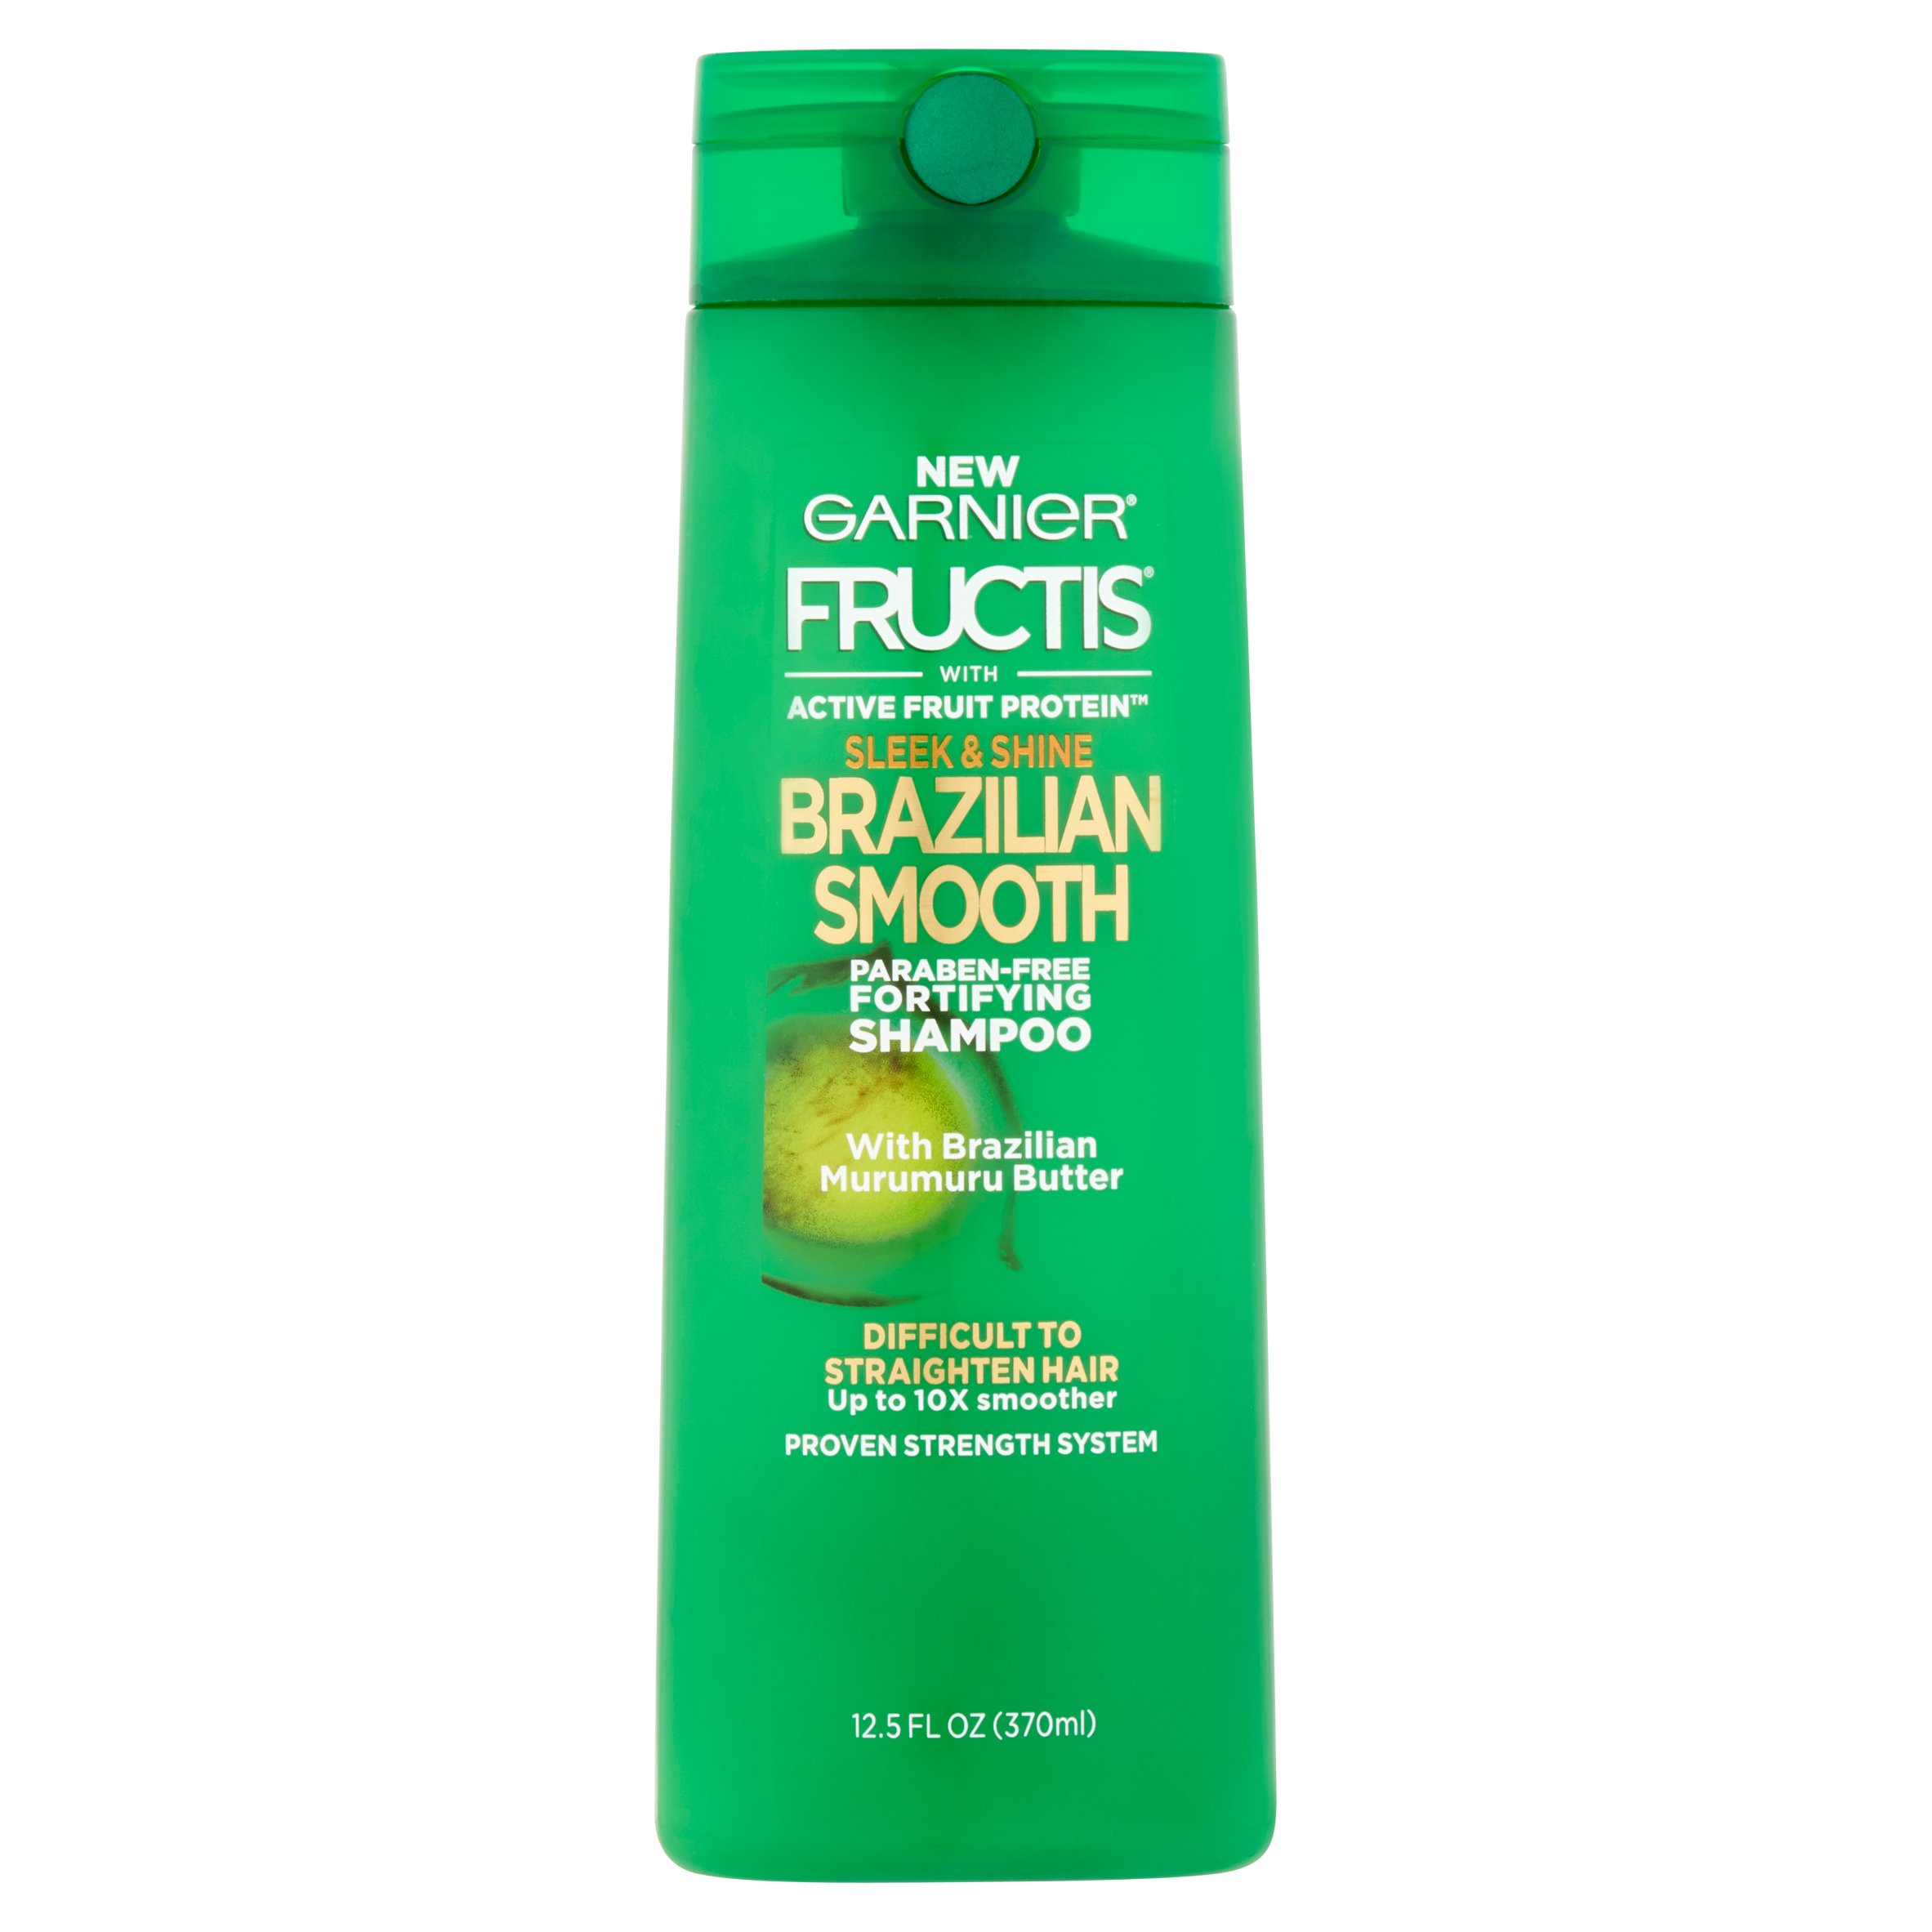 Garnier Fructis Sleek & Shine Brazilian Smooth Shampoo 12.5 FL OZ